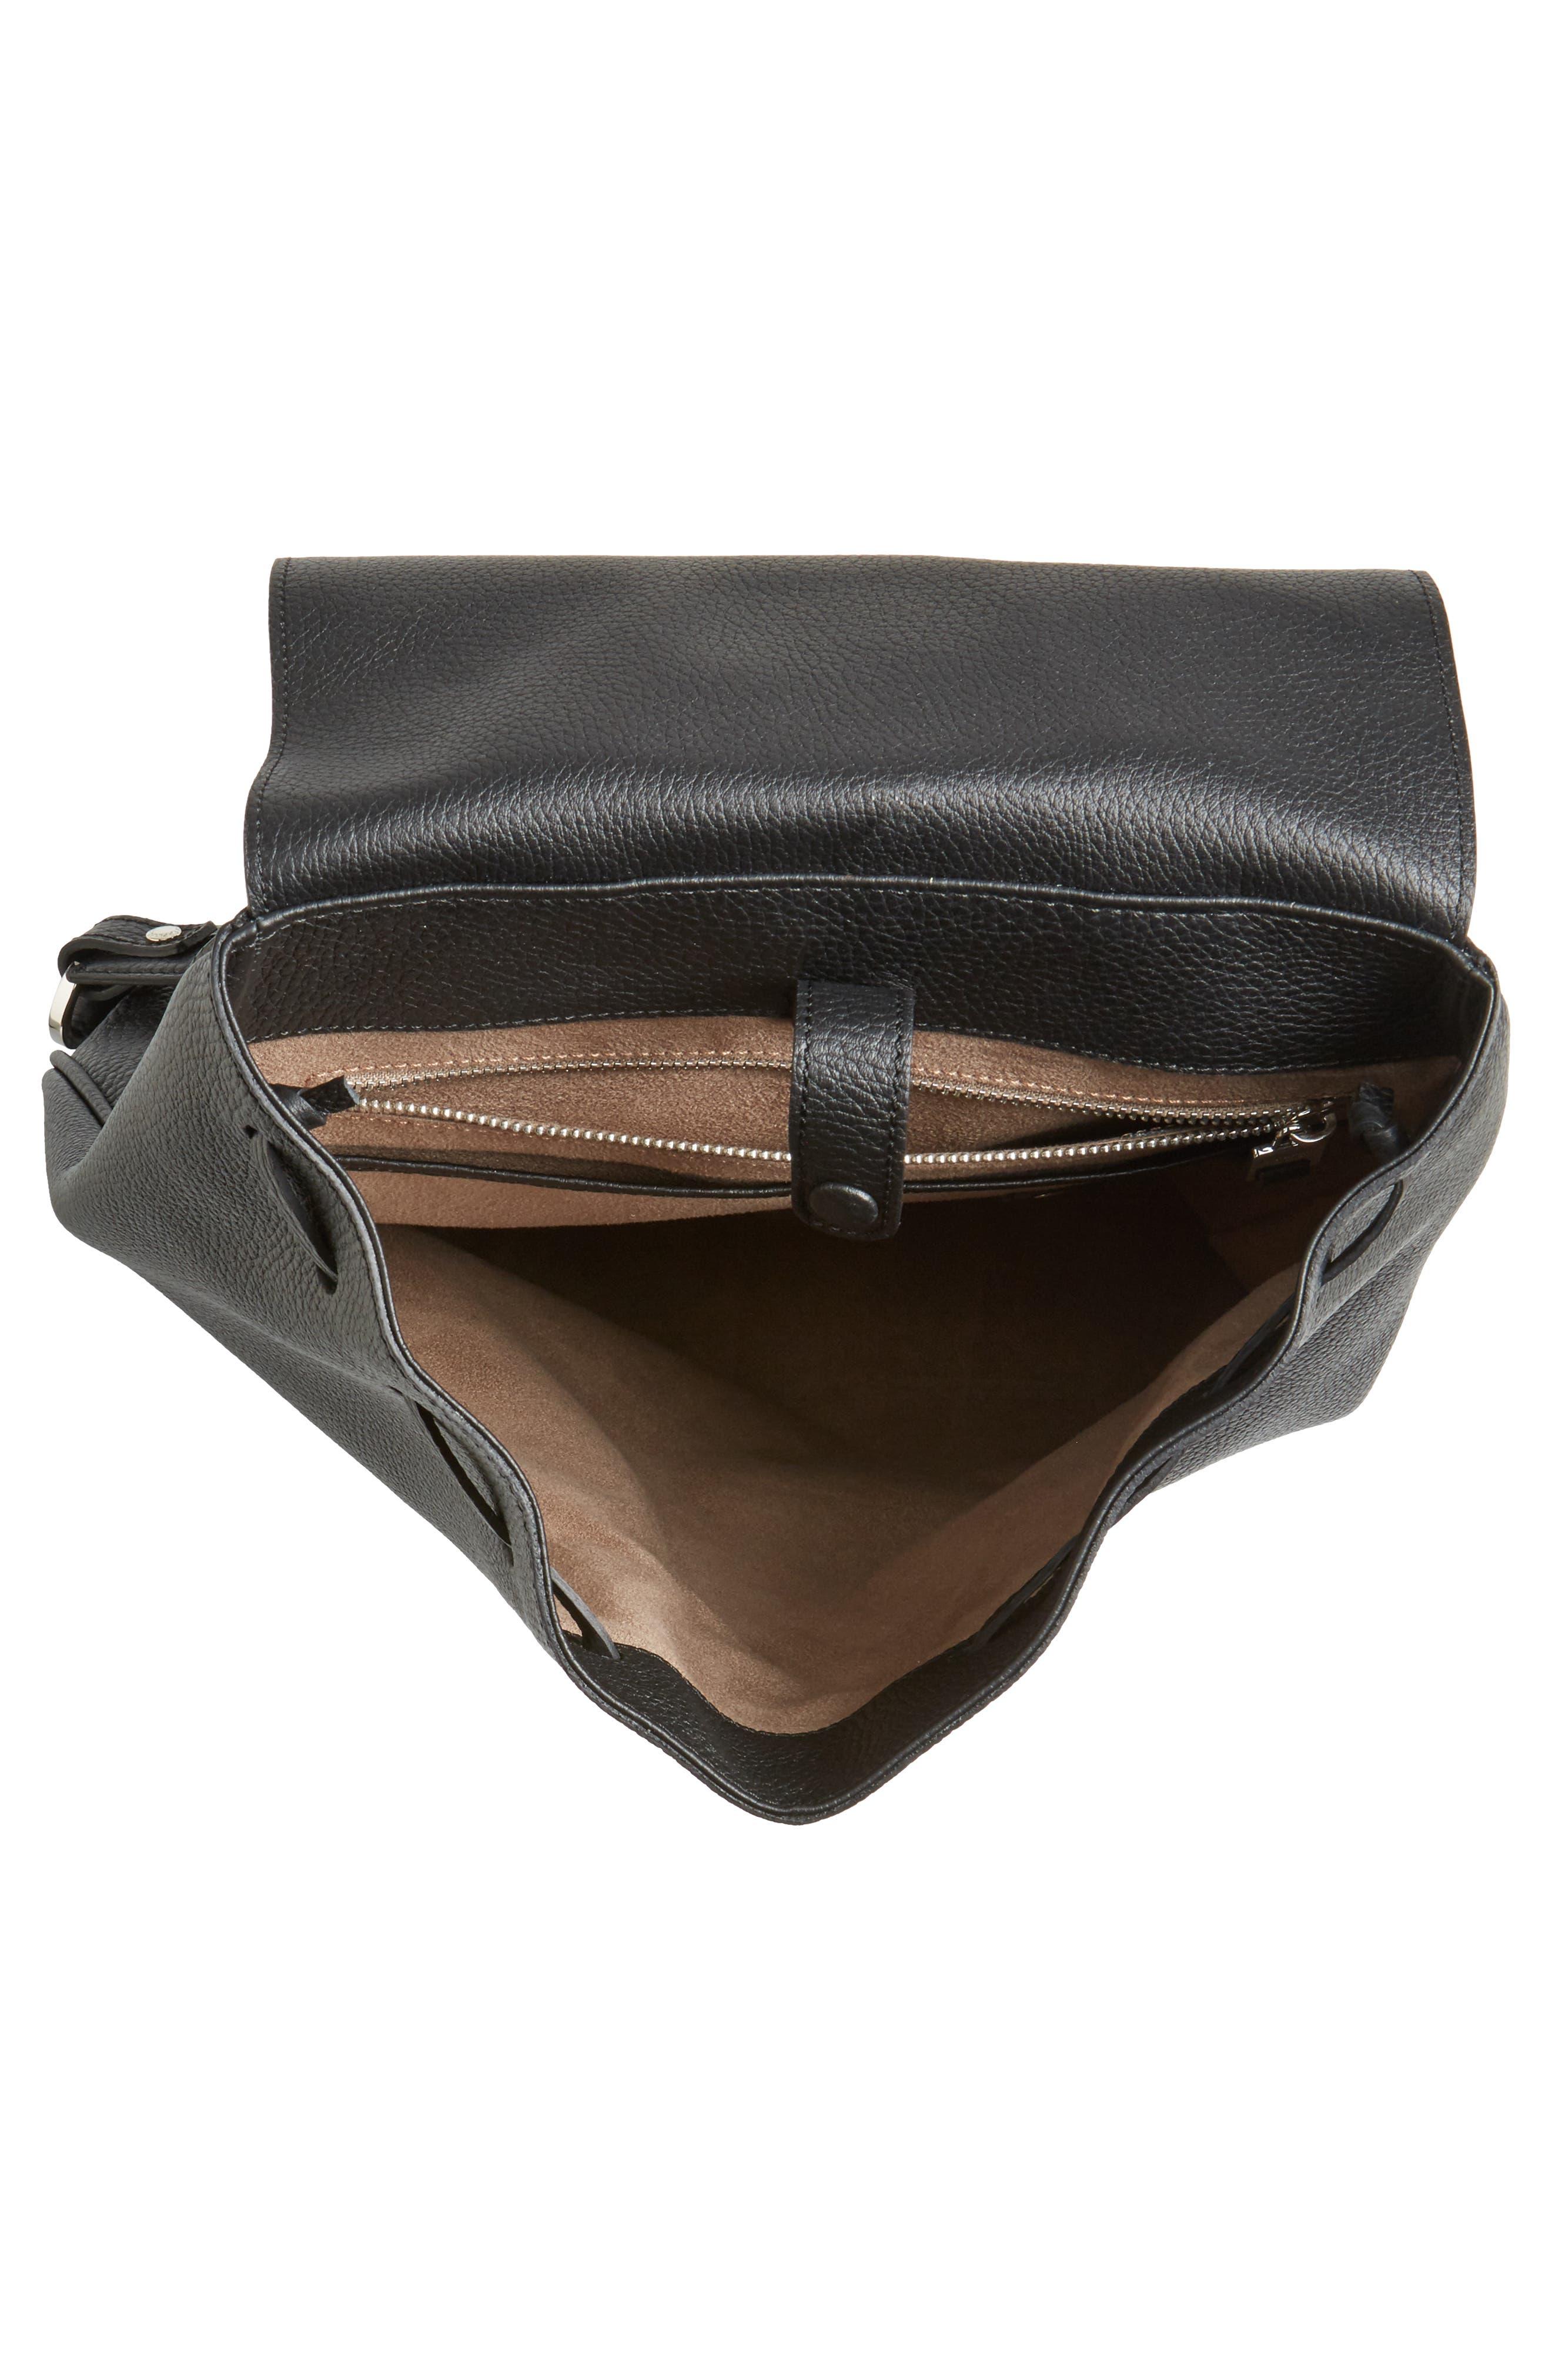 Carmen Cachemire Leather Backpack,                             Alternate thumbnail 4, color,                             Black